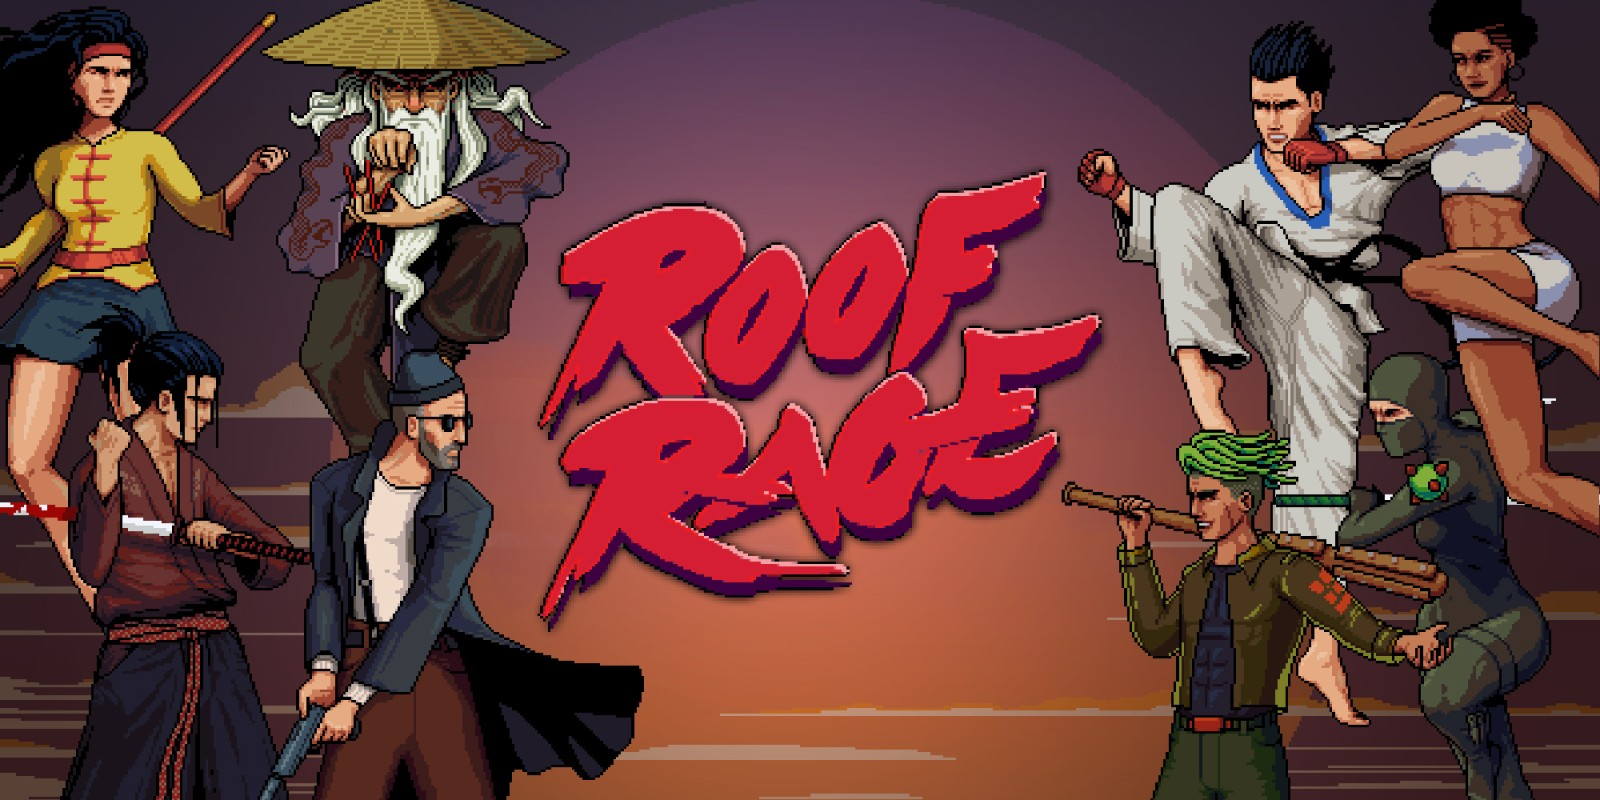 Roof Rage |